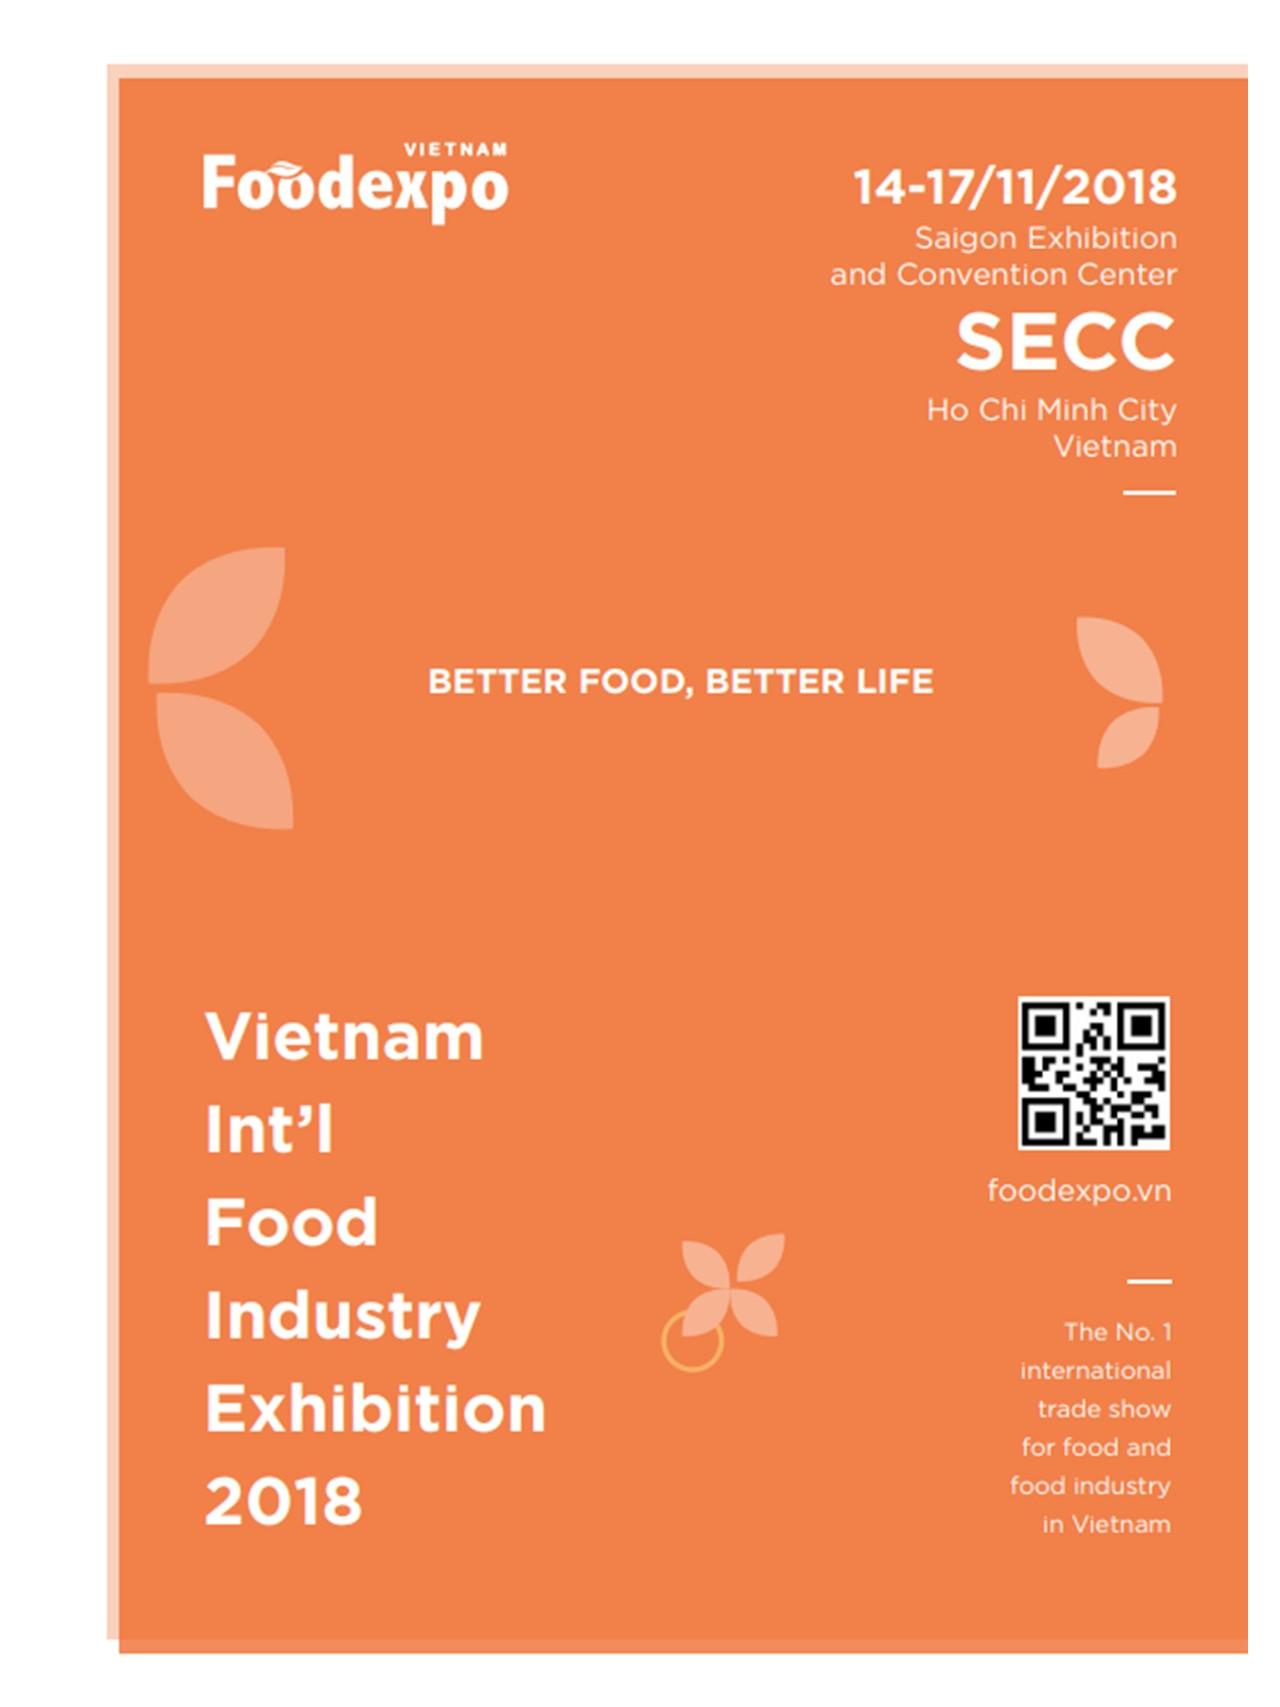 Vietnam Food Expo 2018 - 2018/11 | Online Trade Fair Database (J